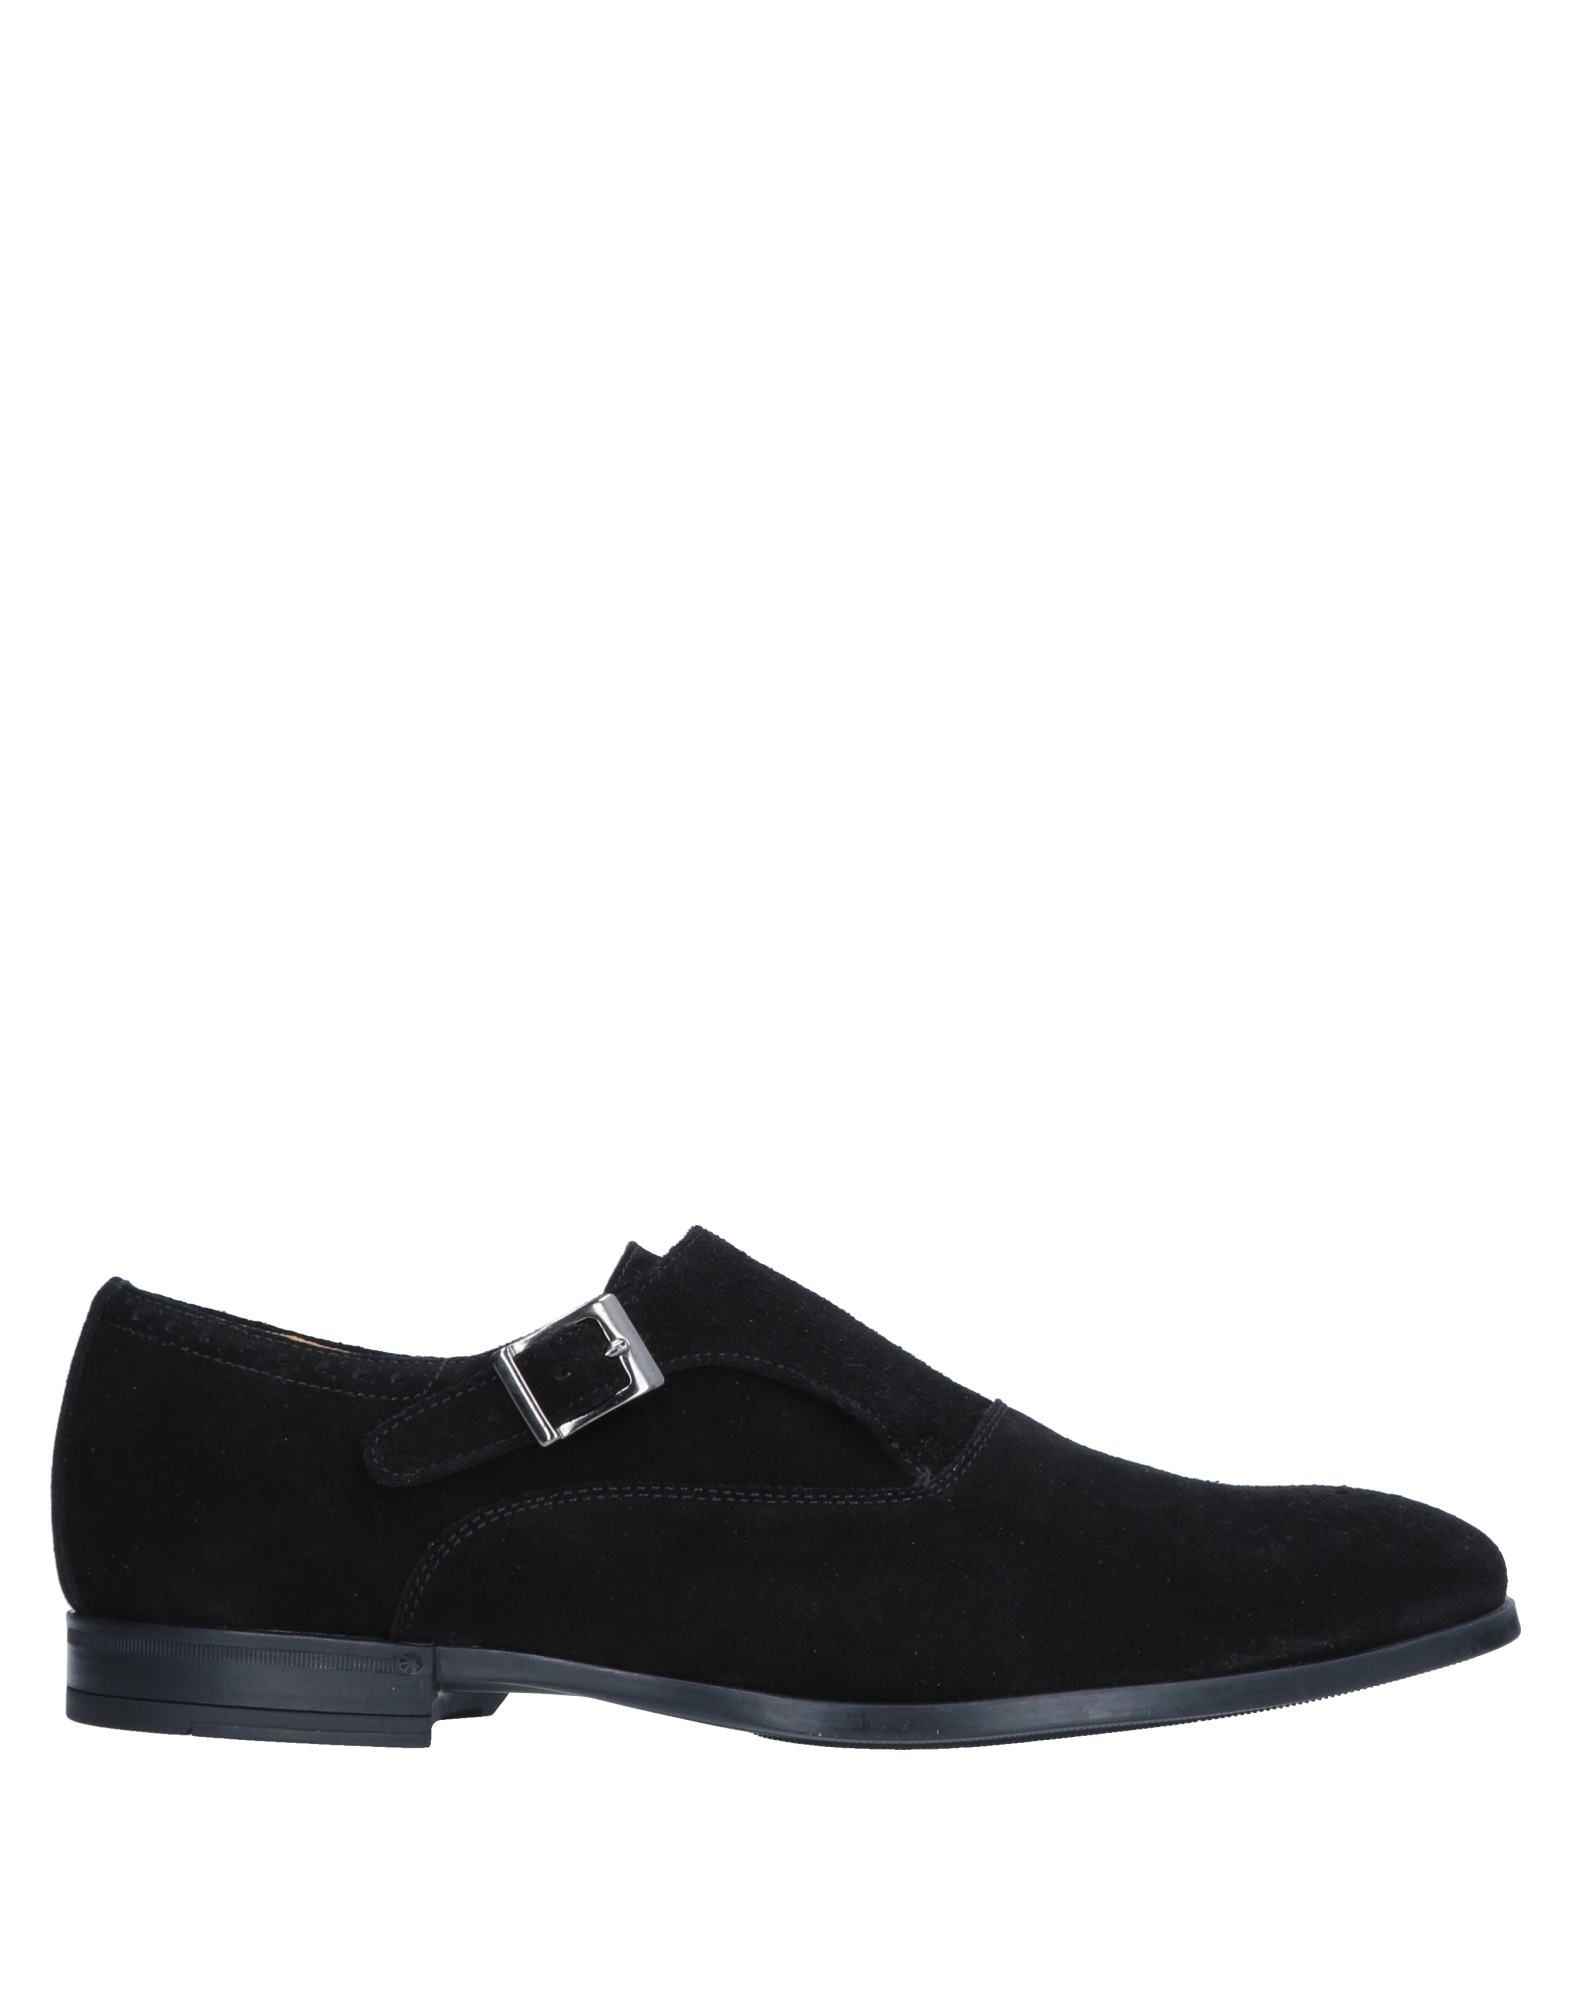 Fabiano Ricci Mokassins Herren  11546760VB Gute Qualität beliebte Schuhe